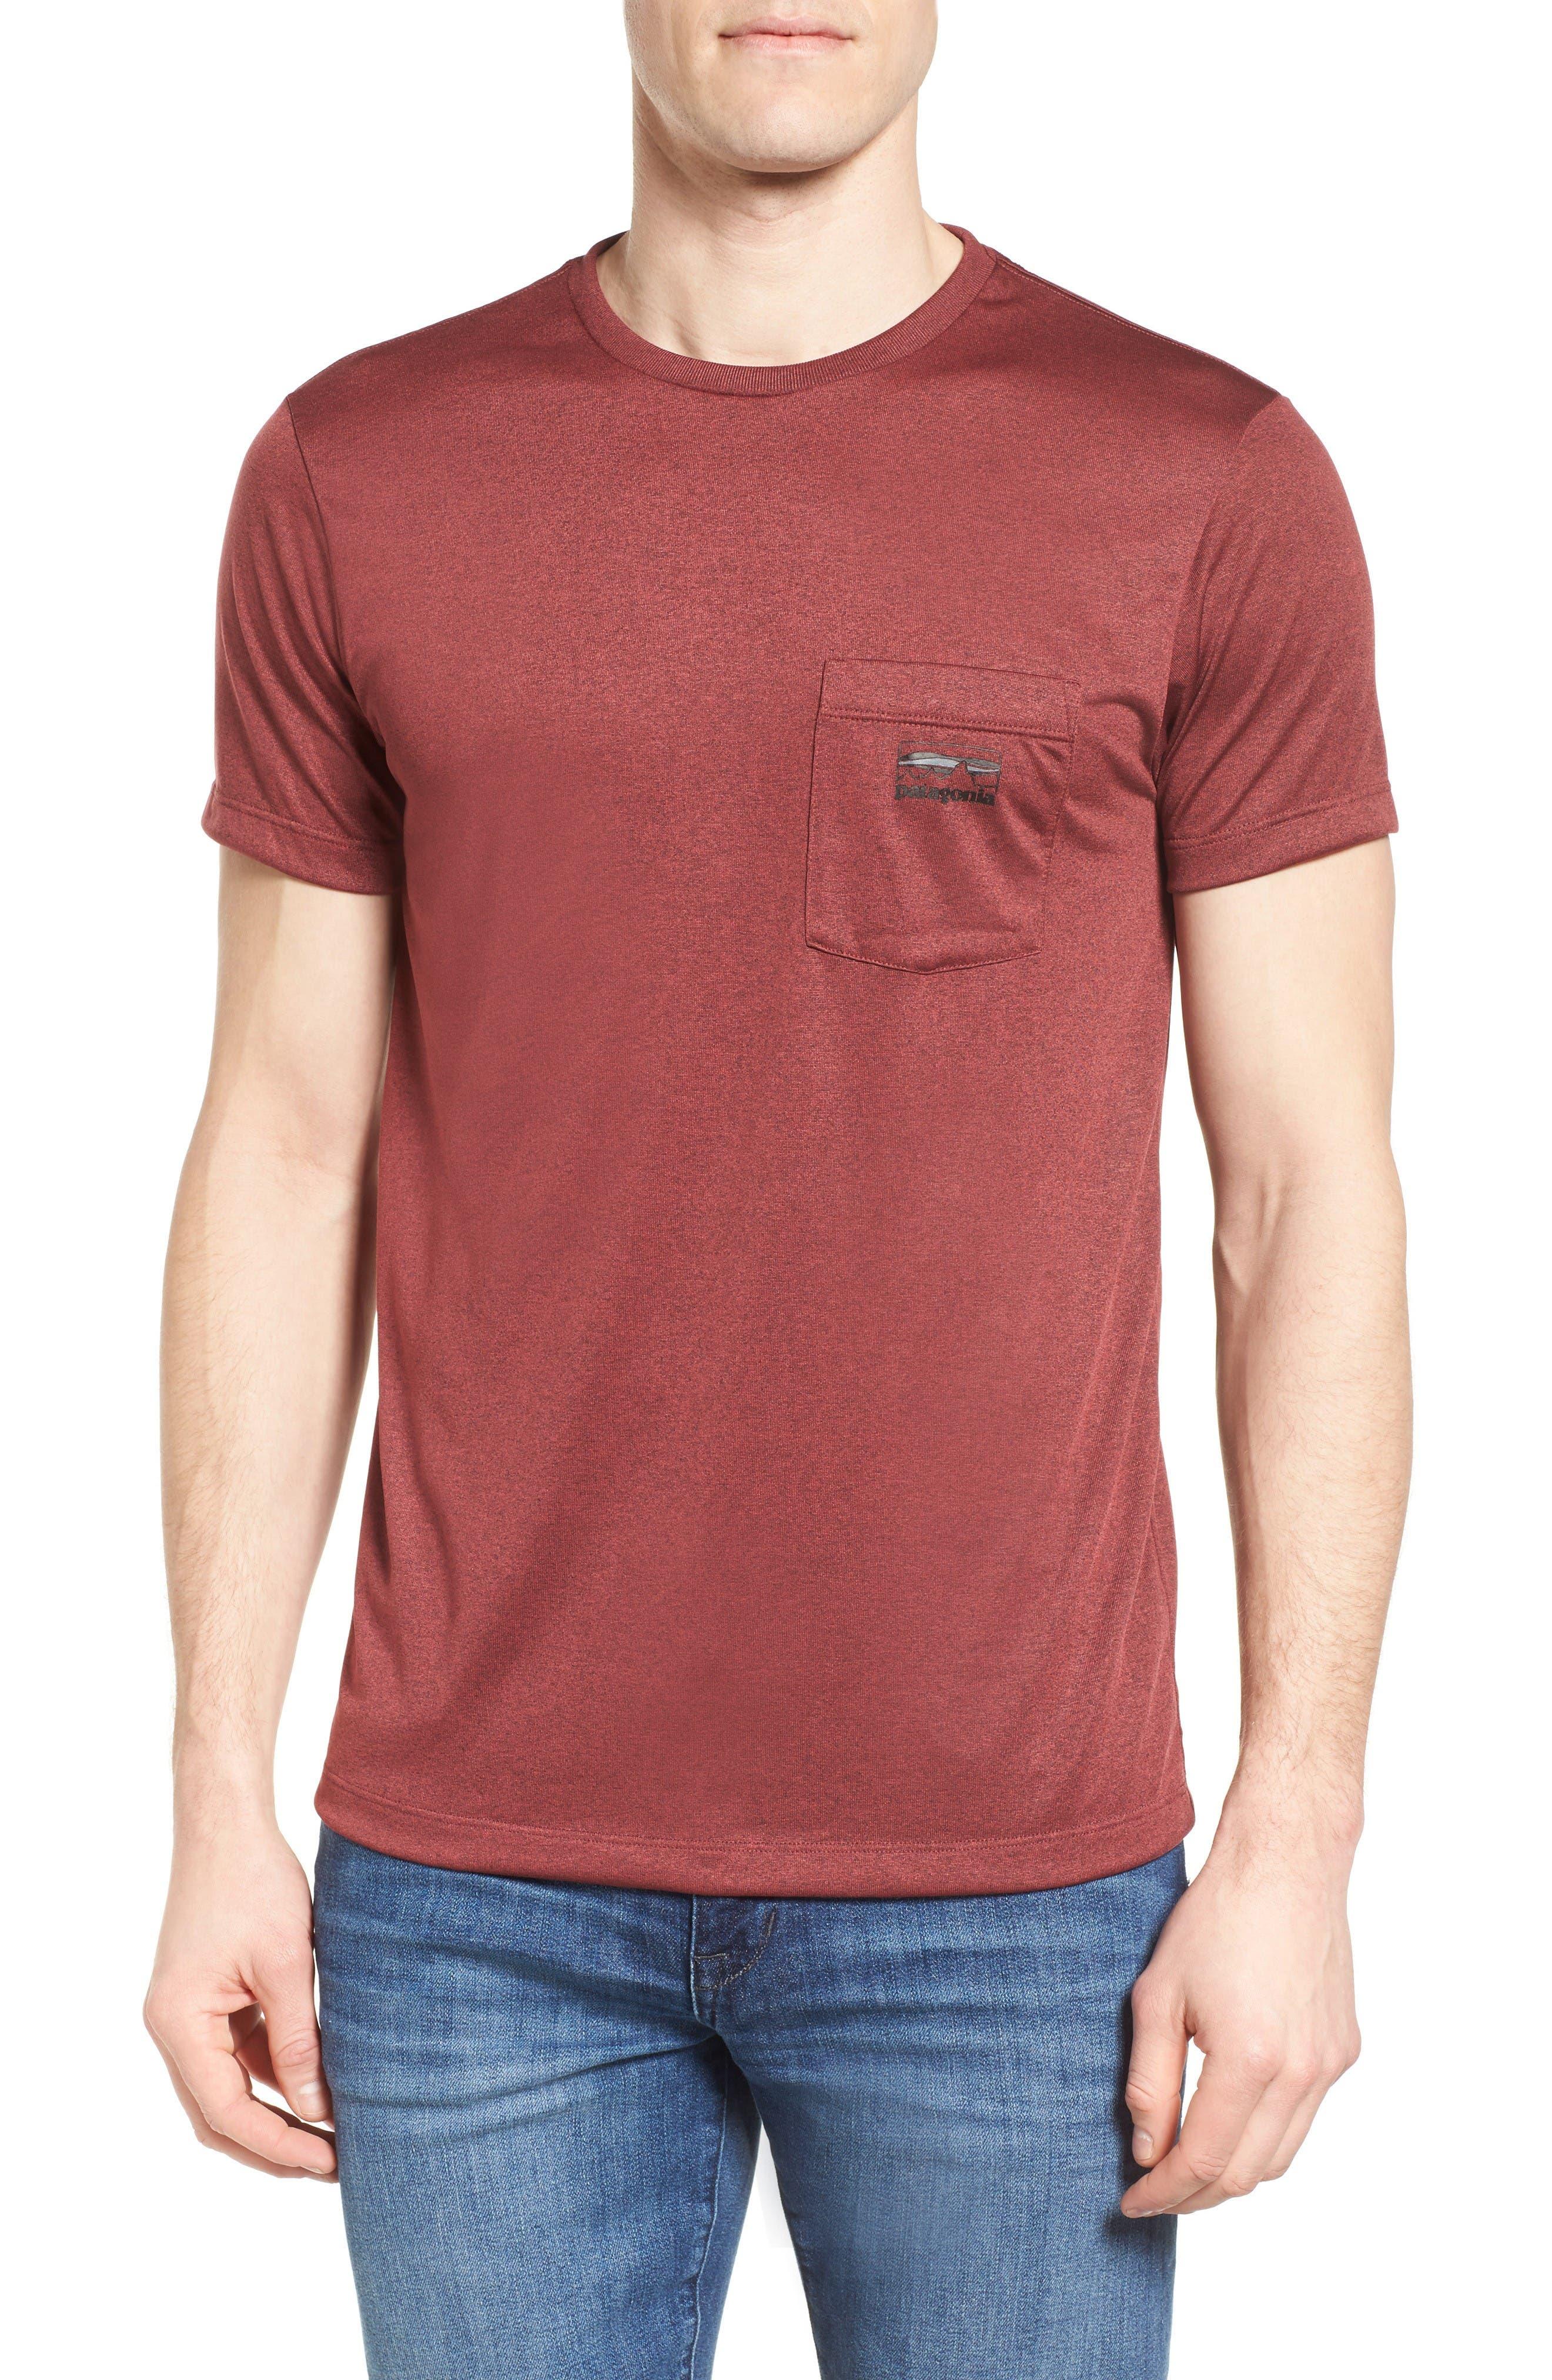 Patagonia '73 Logo Slim Fit T-Shirt